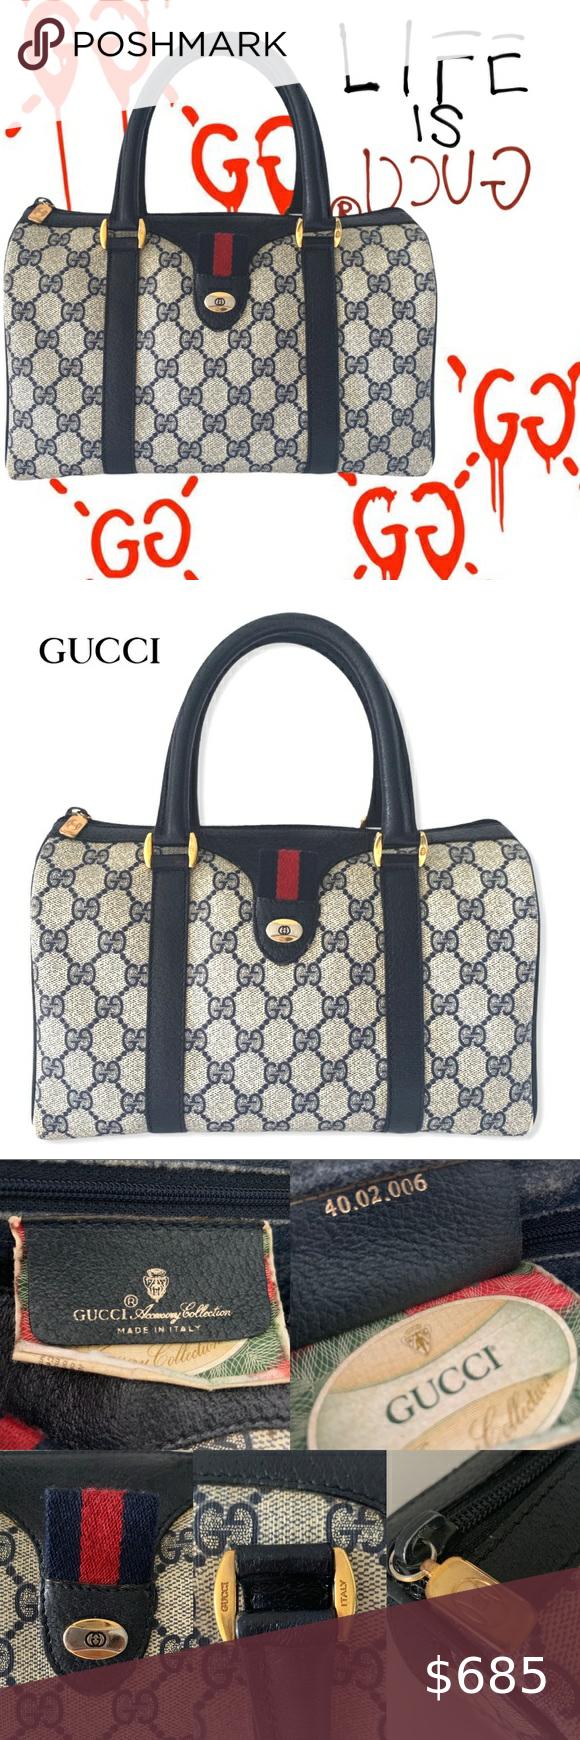 Gucci Bag Gucci Bag Gucci Vintage Bag Gucci Shoulder Bag